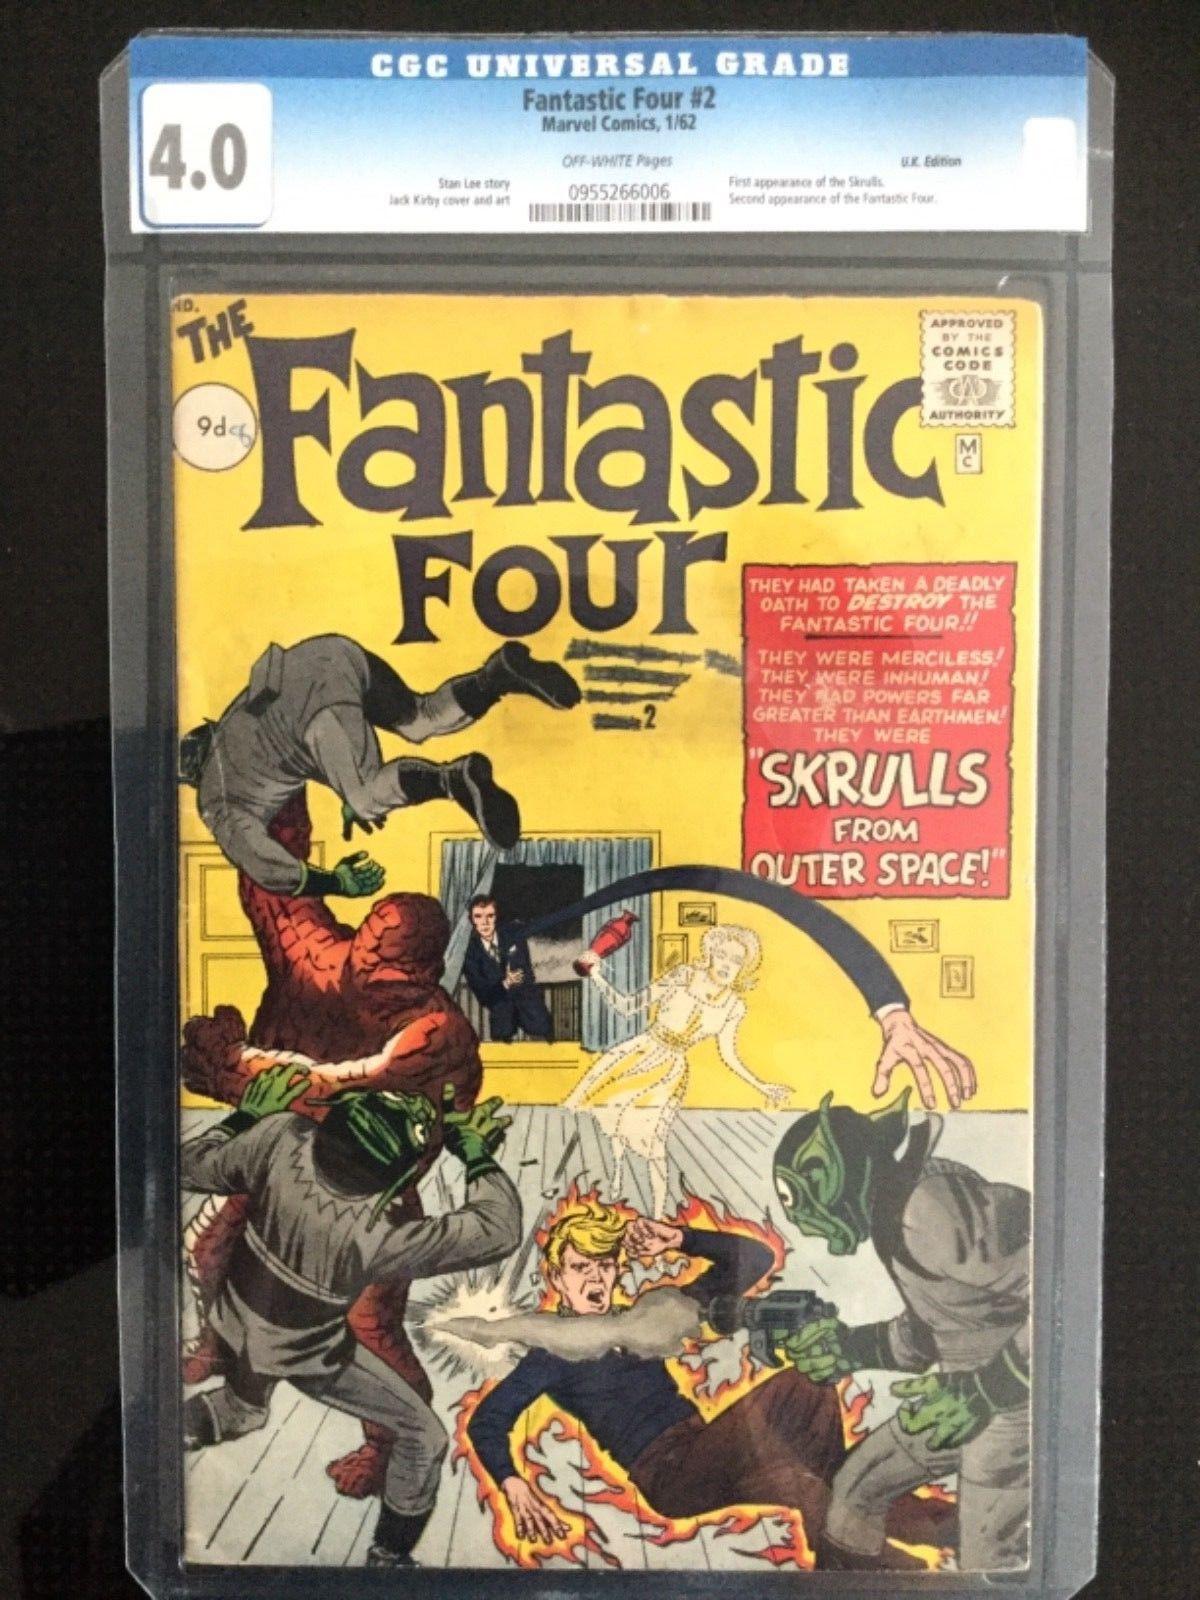 The Fantastic Four #2, 1/62, CGC 4.0, U.K.Edition